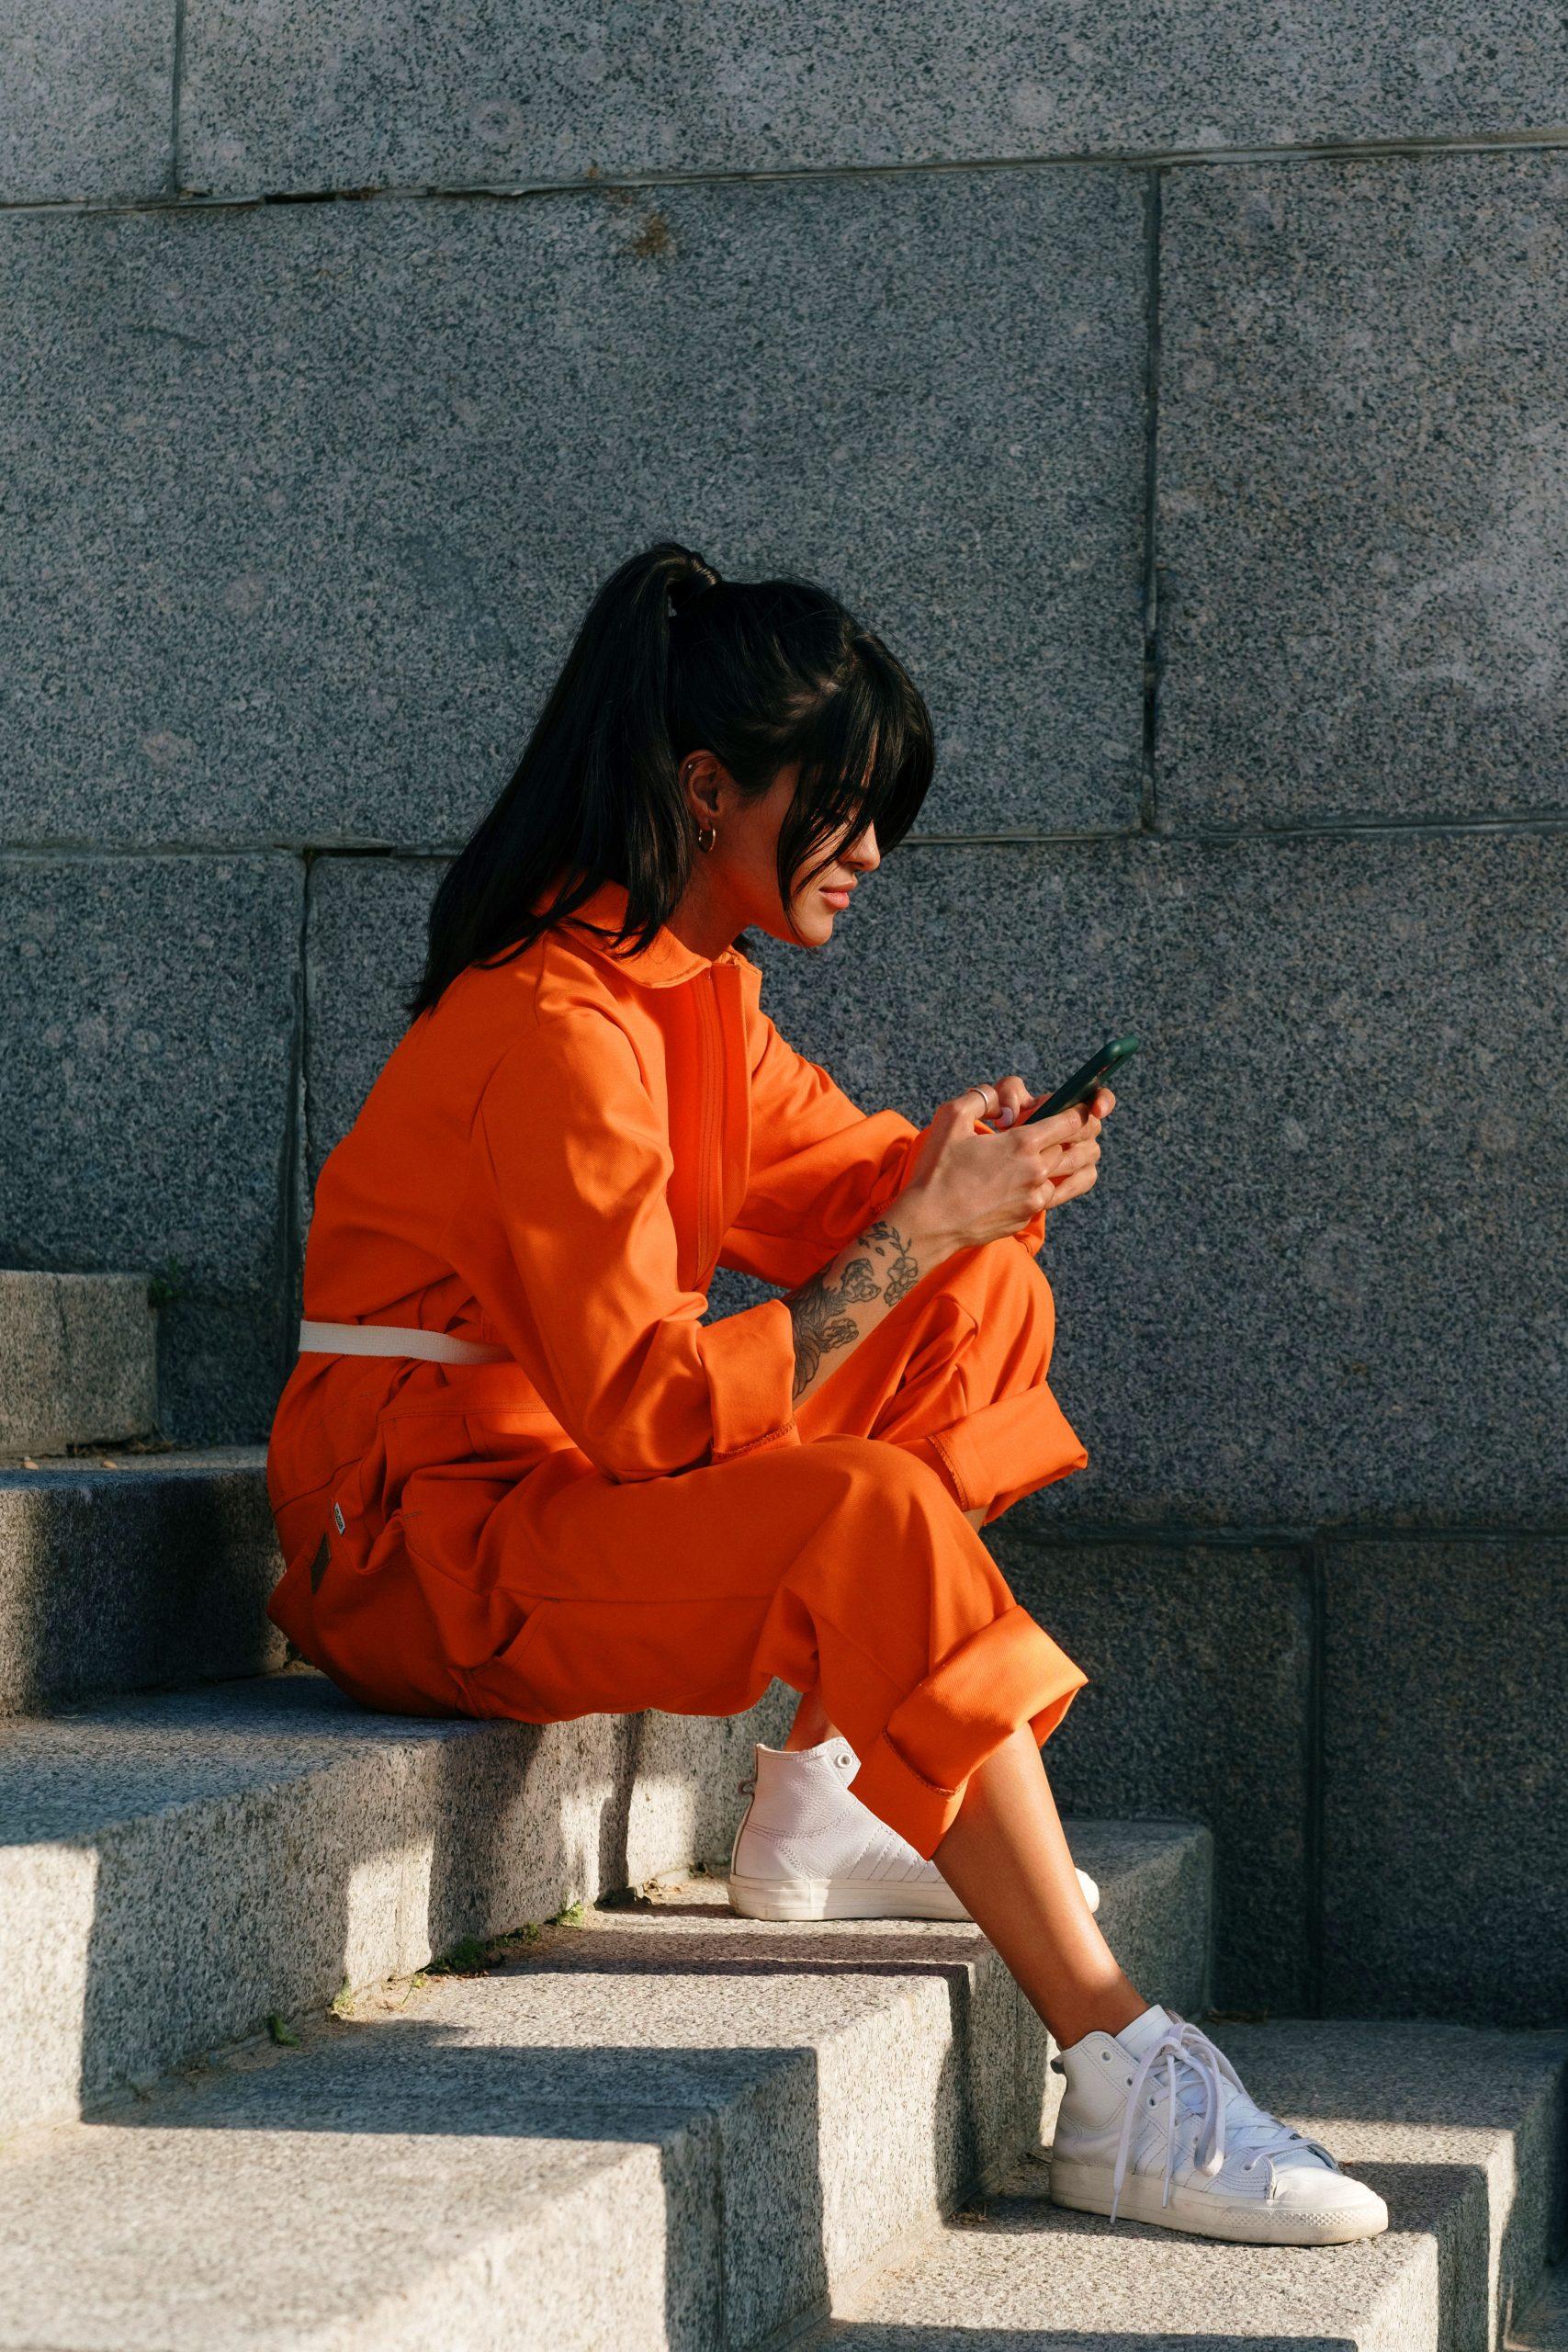 Sad Girl Whatsapp Dp Images photo for hd